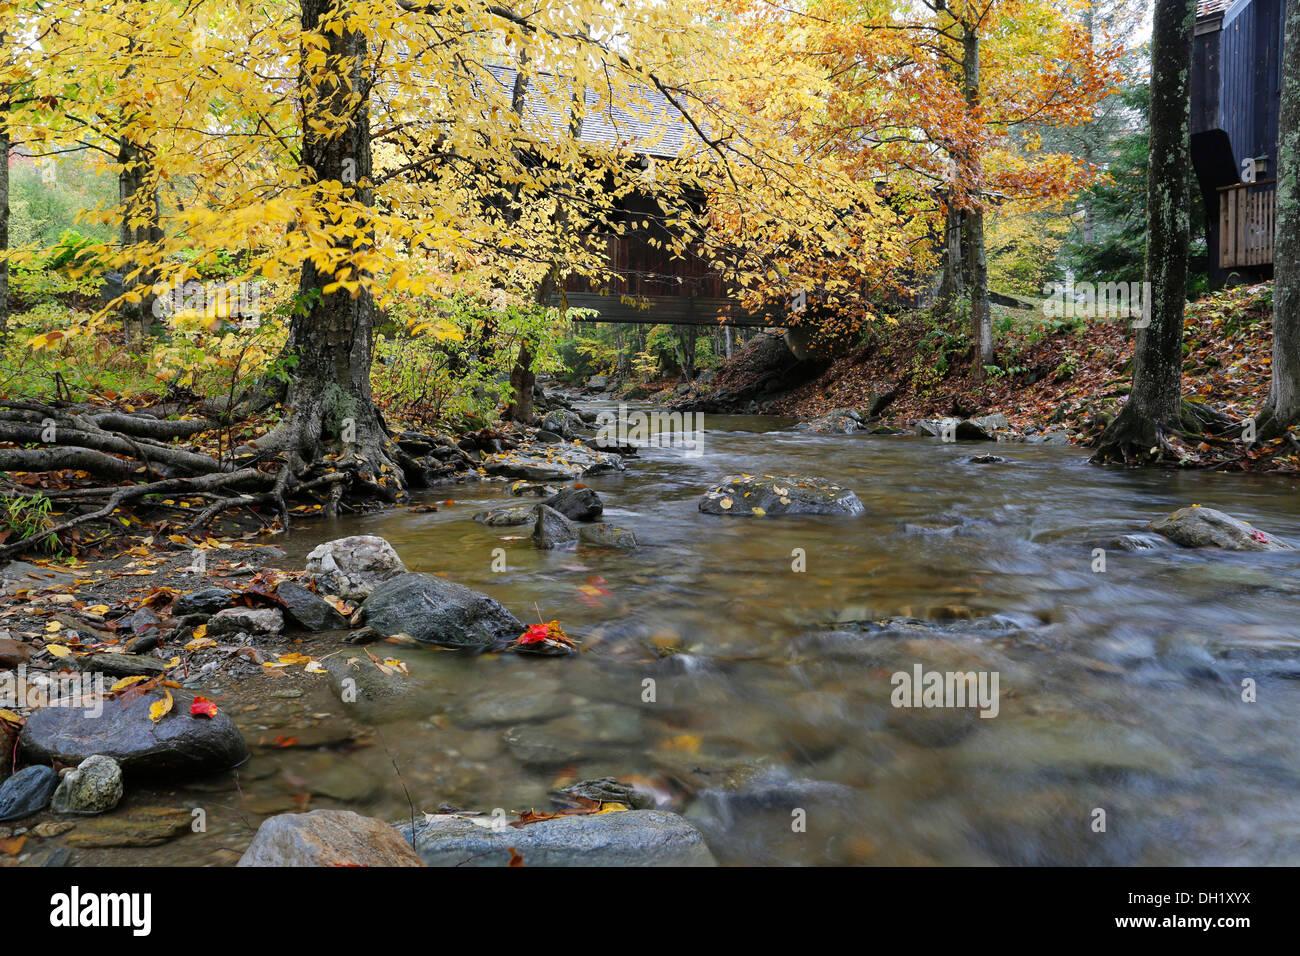 Battleground Covered Bridge in autumn, Mill Brook, Vermont, USA - Stock Image